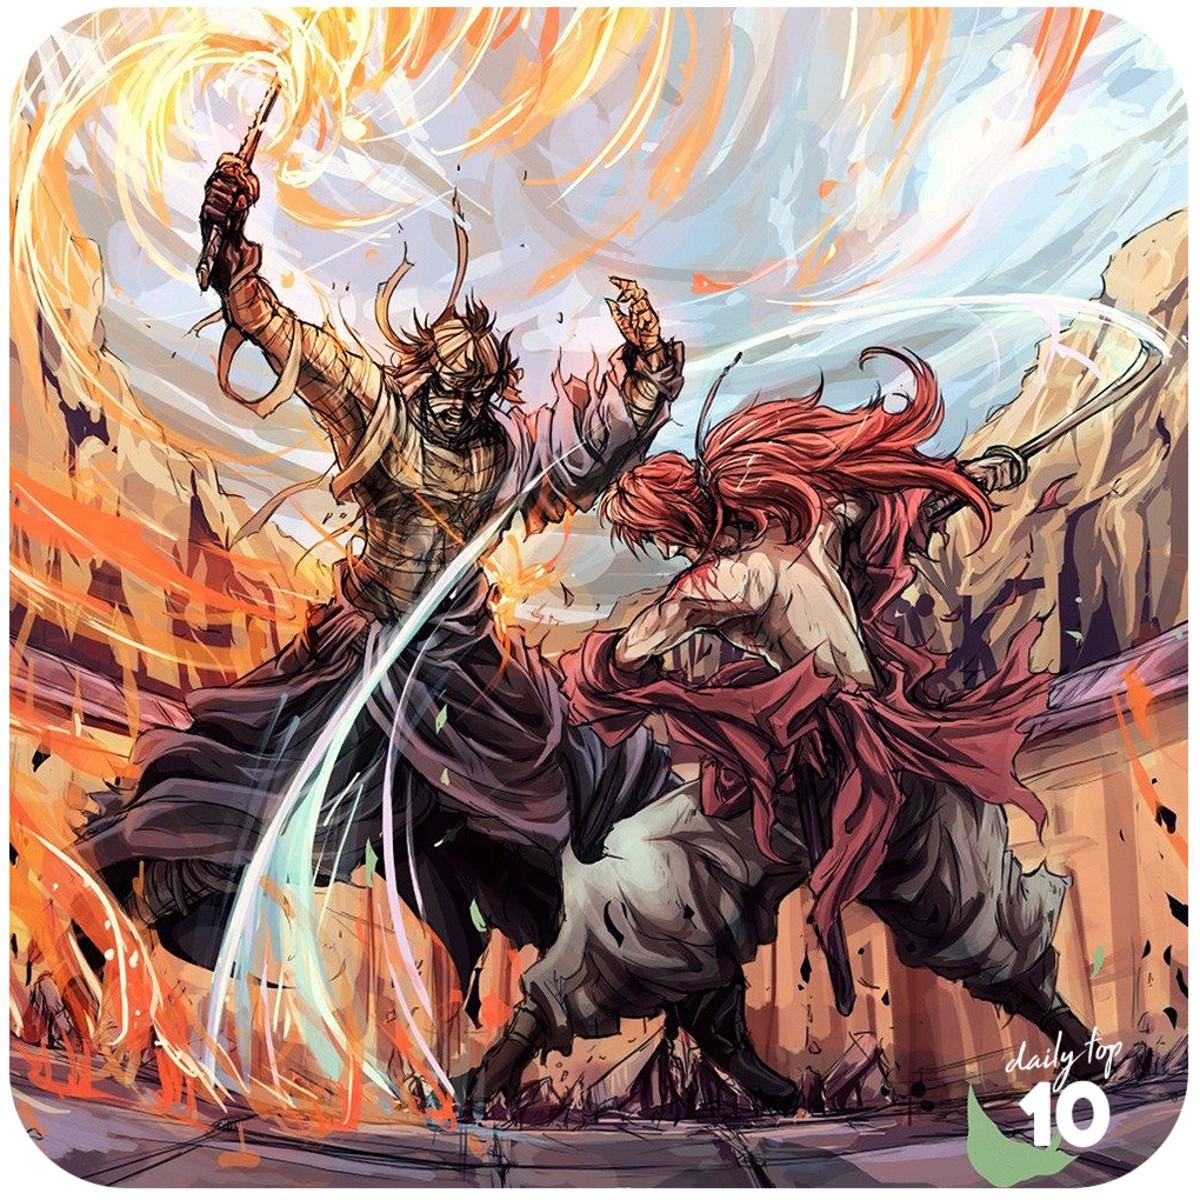 Kenshin Himura vs Shishio Makoto